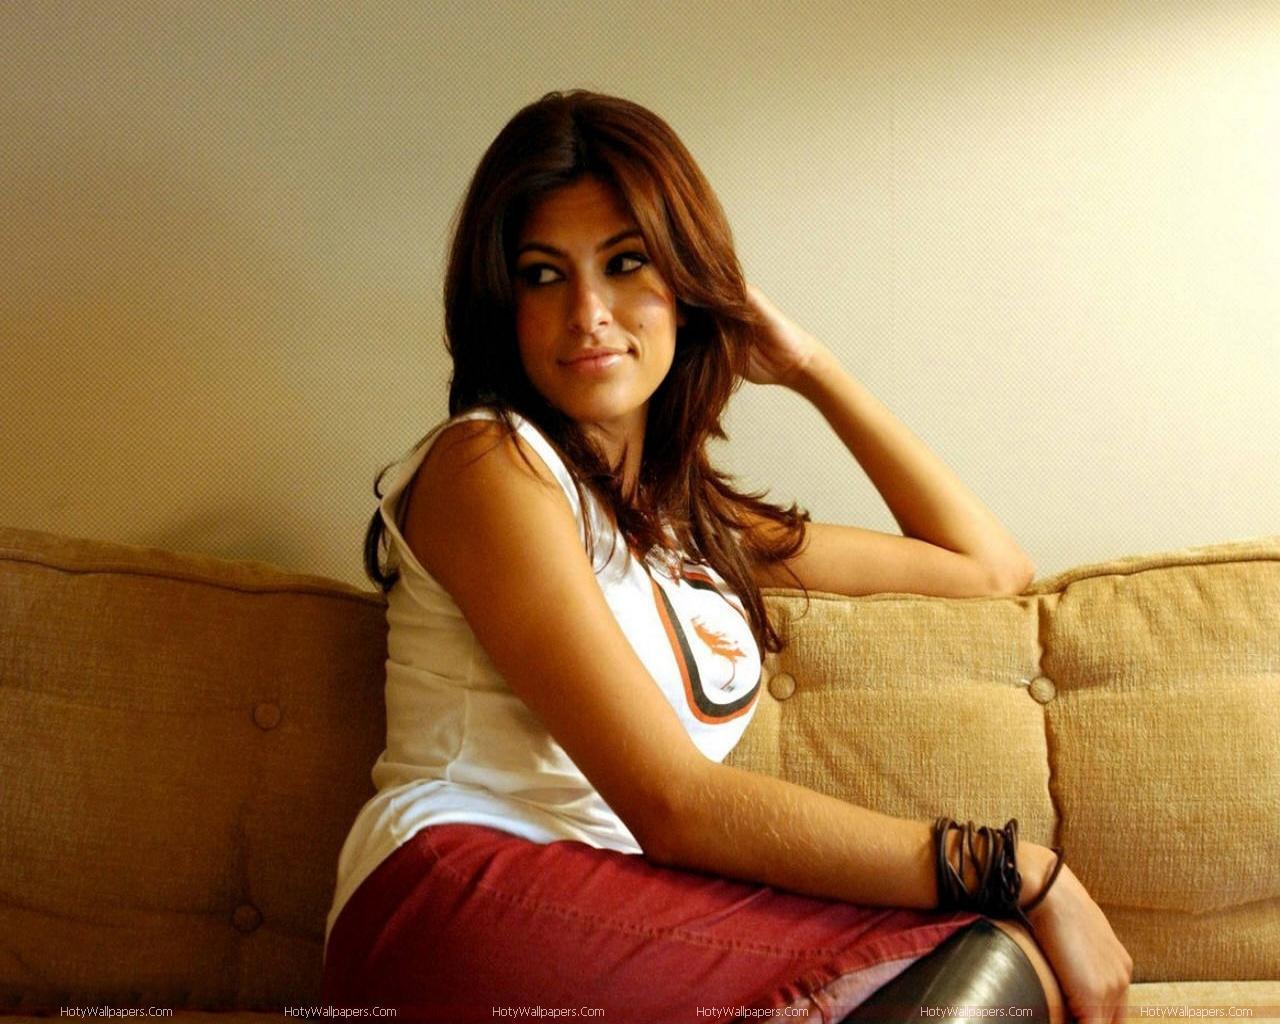 http://3.bp.blogspot.com/-6BN2m_khk54/TldpxsovEFI/AAAAAAAAJxg/fFj1JJP4chE/s1600/actress-Eva-Mendes_wallpaper.jpg